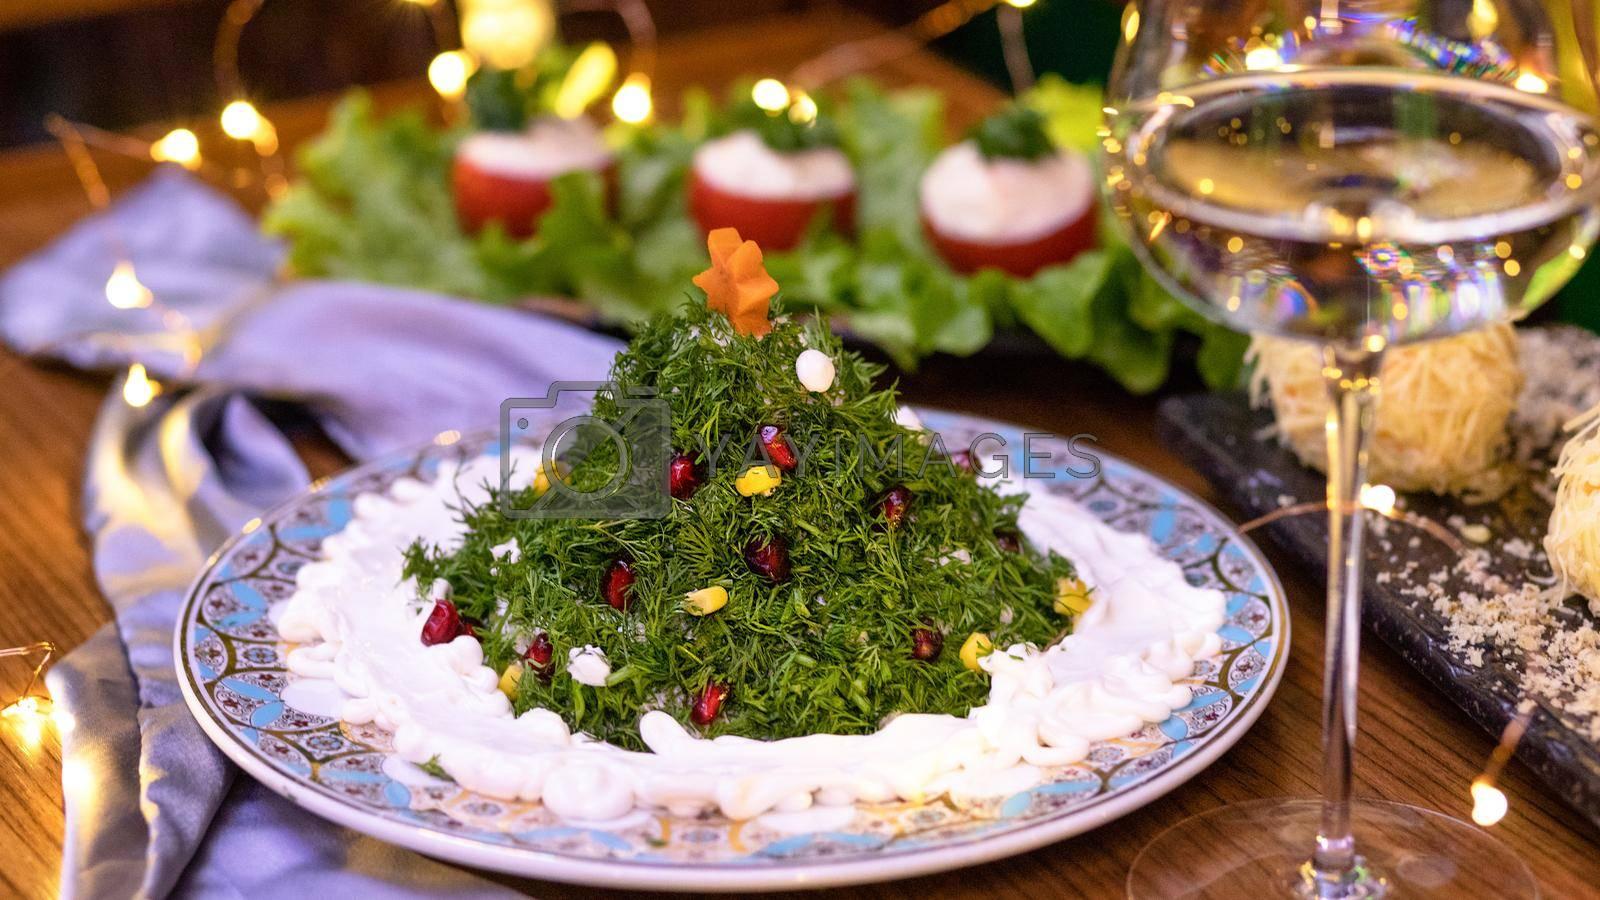 Salad like a new year tree close up